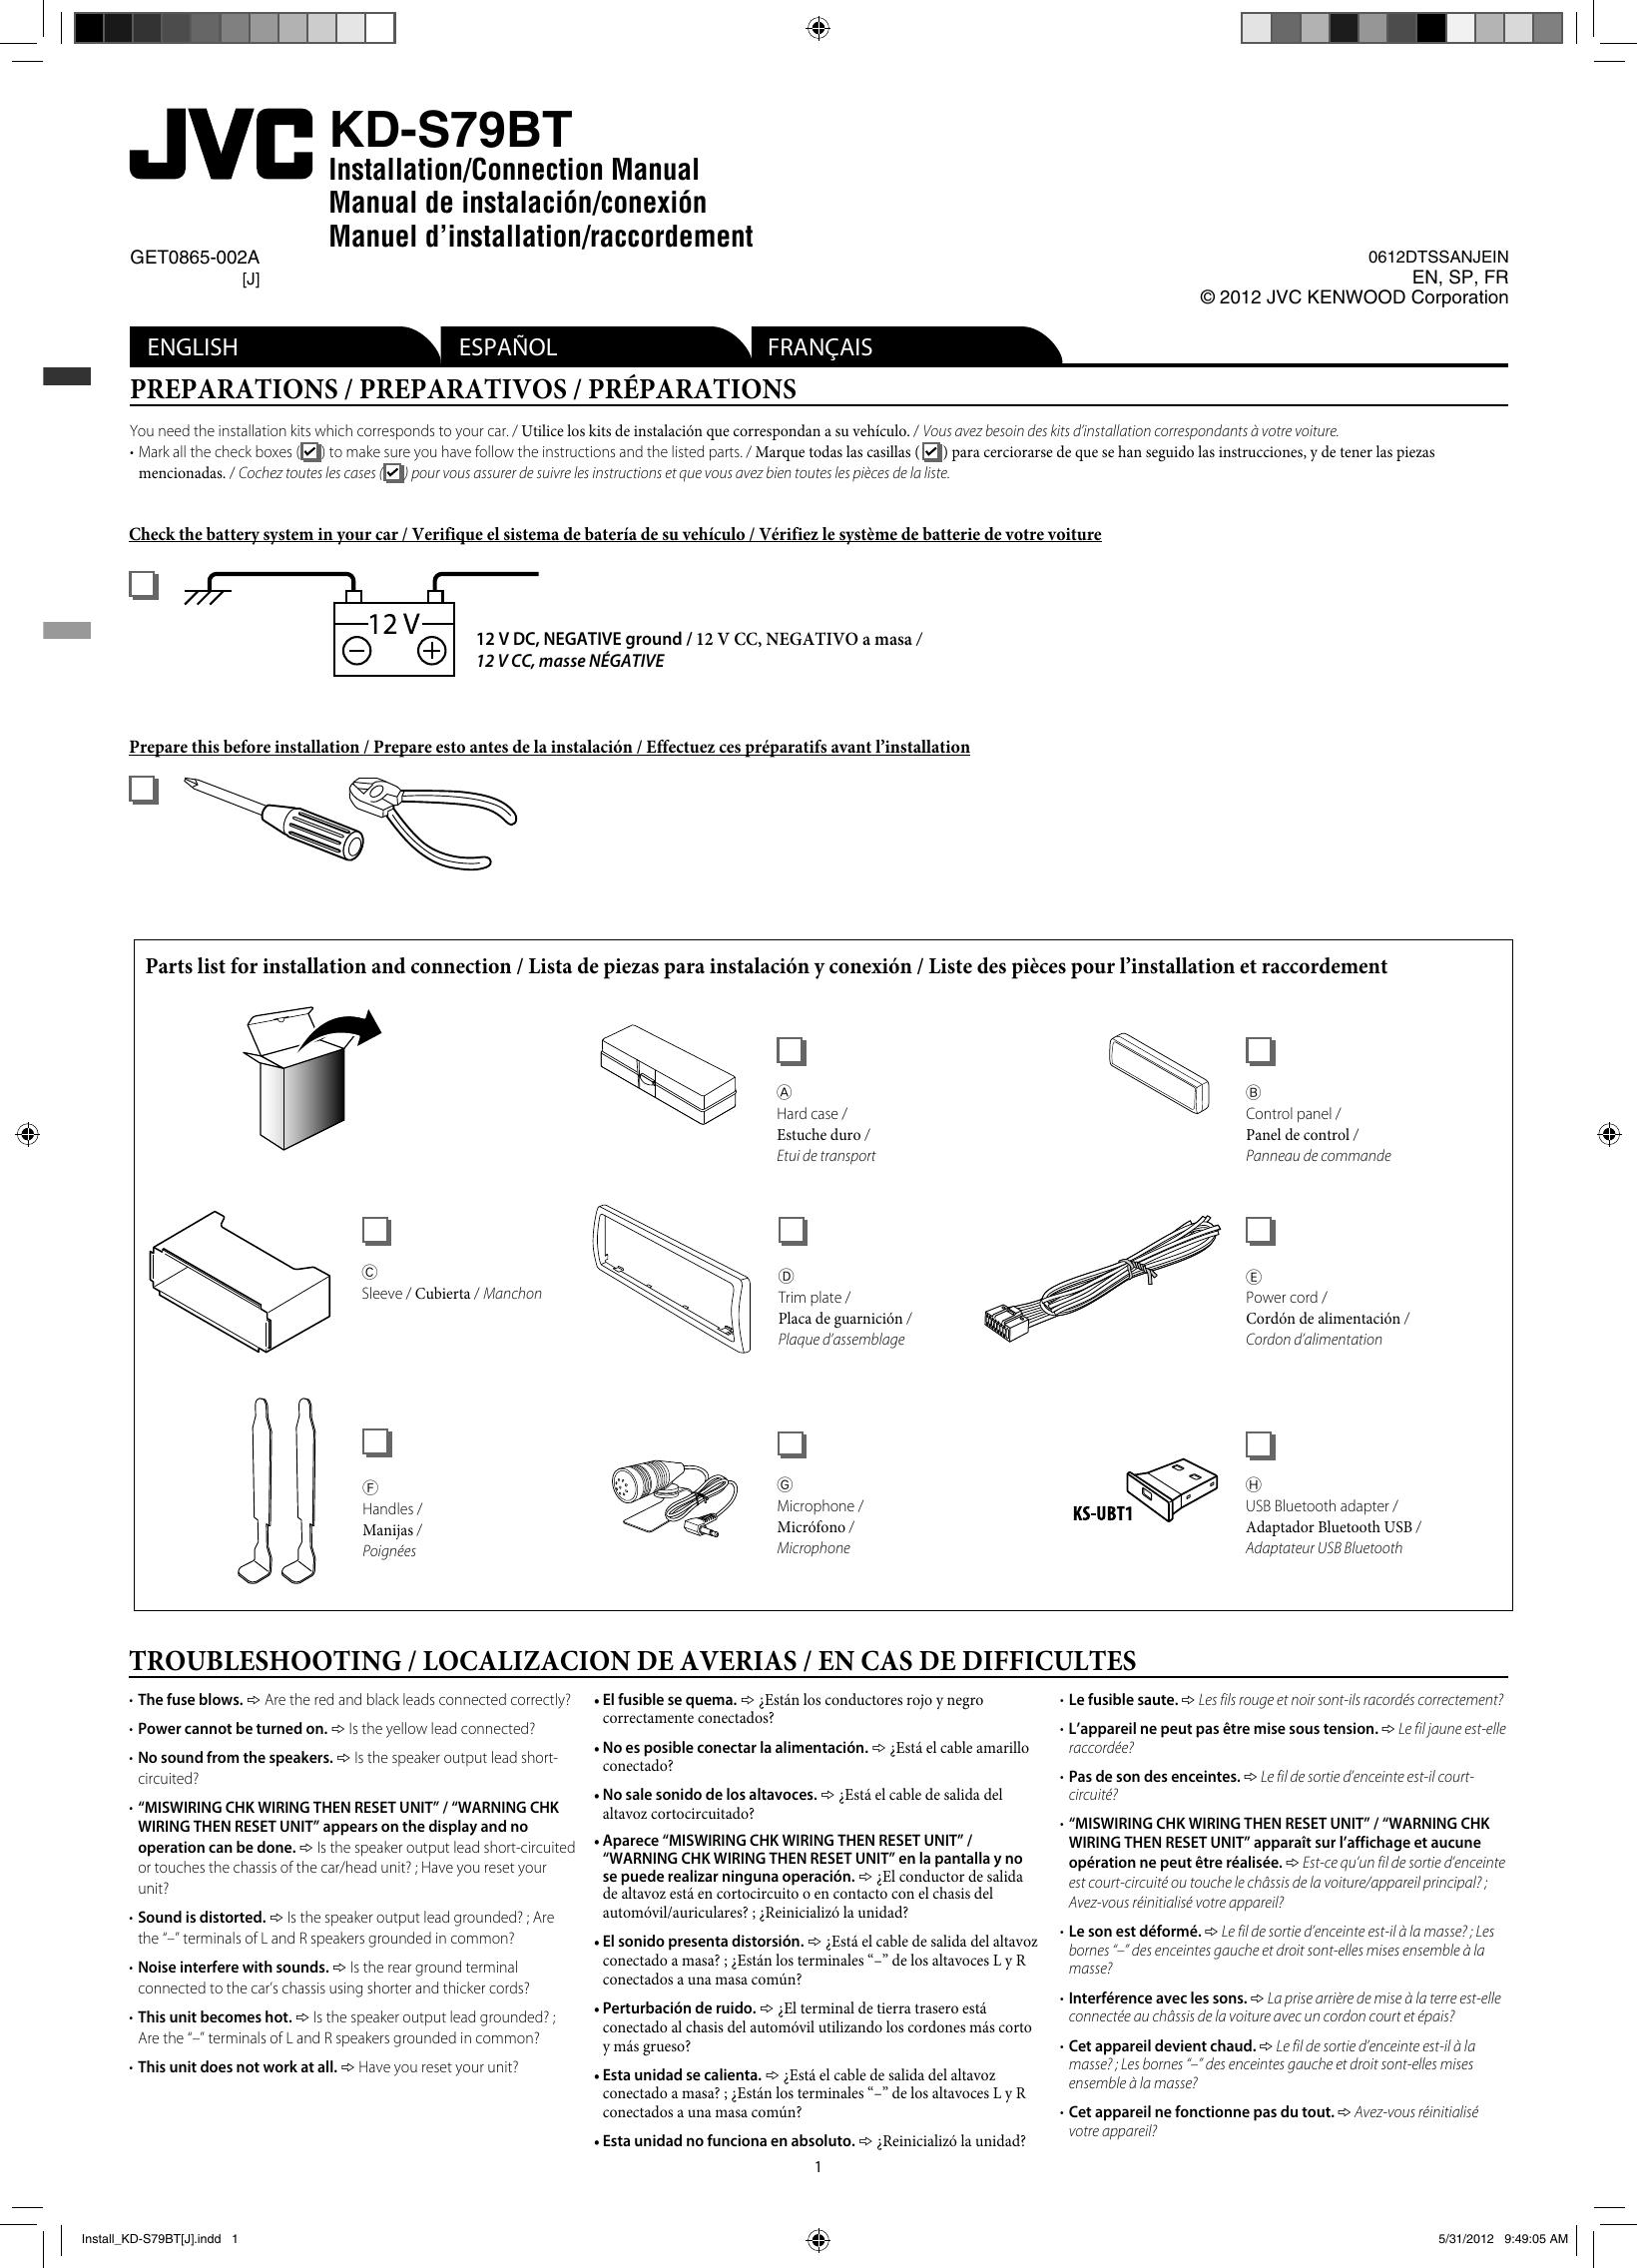 Jvc Kd S79Bt Wiring Diagram from usermanual.wiki